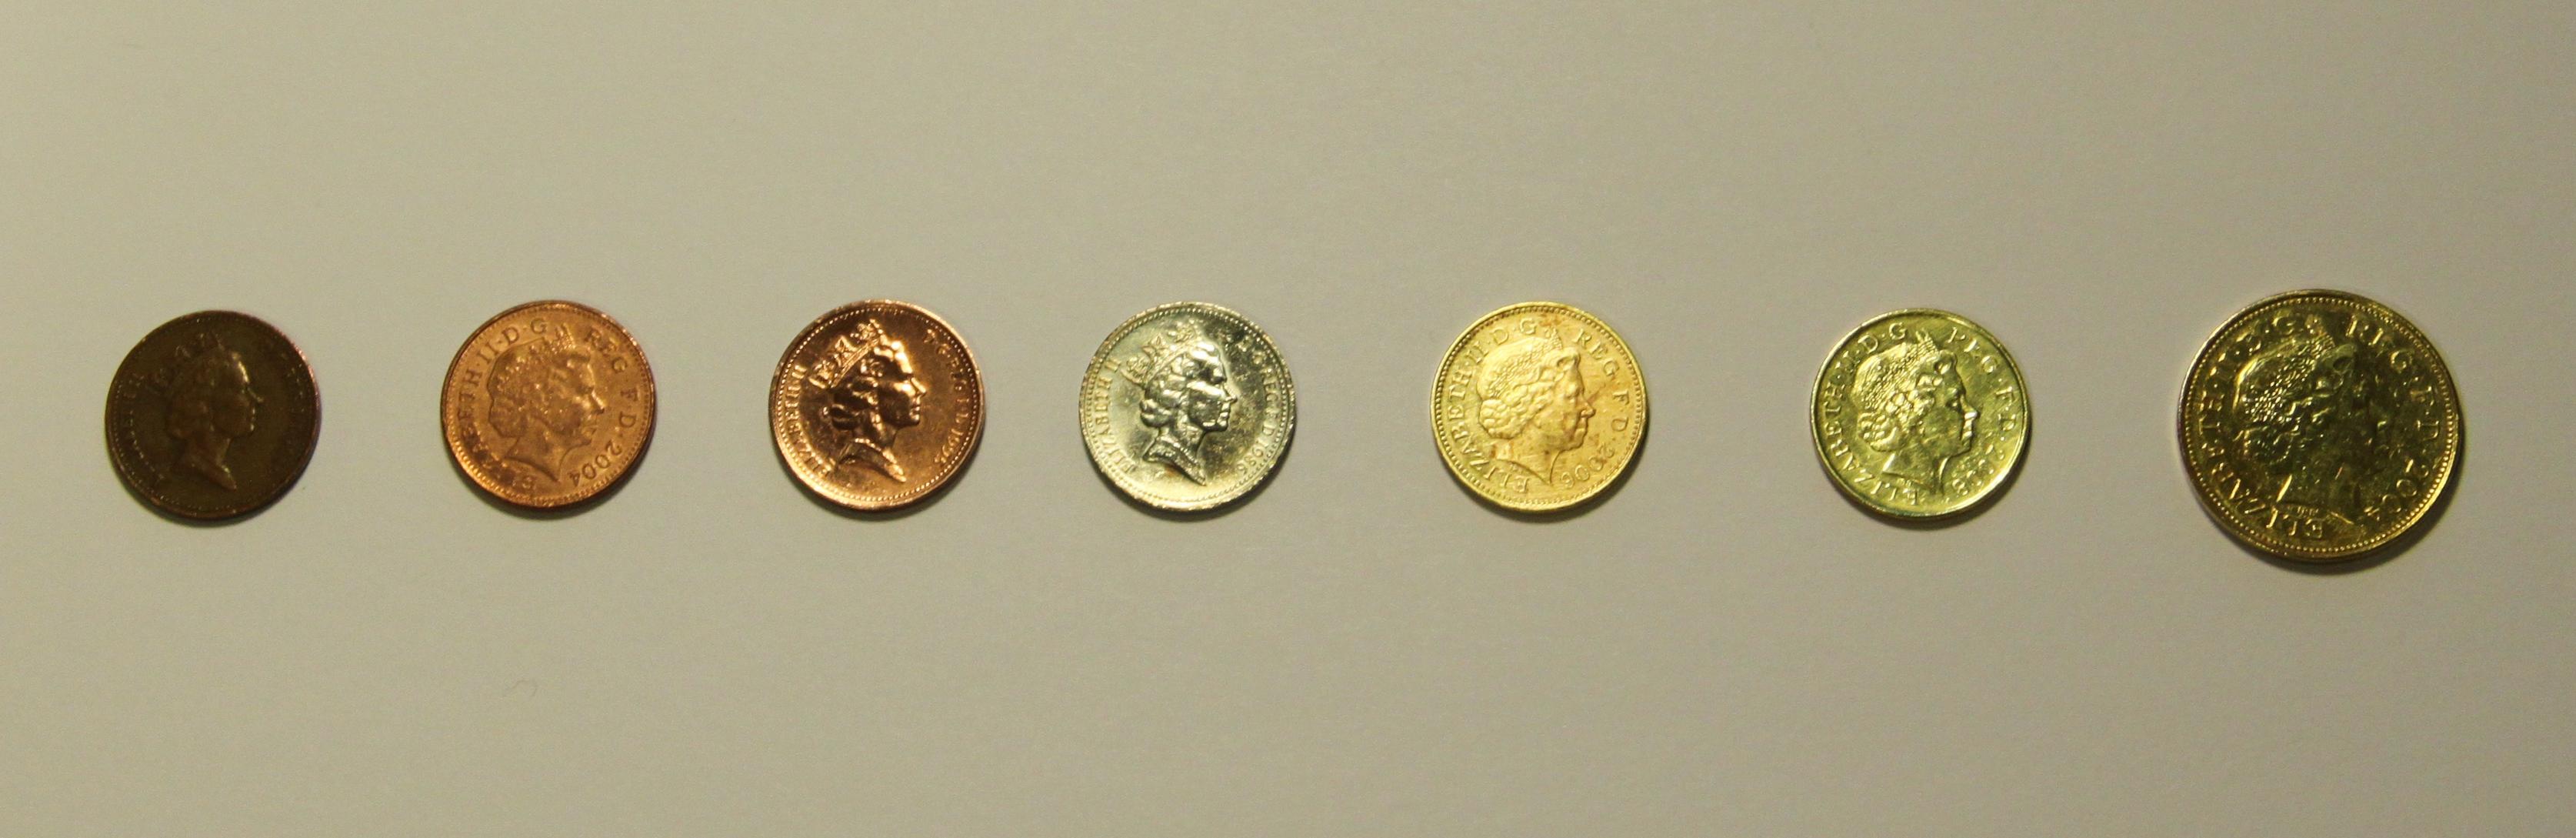 Zinc extraction and brass-coating copper coins - Larkinweb co uk